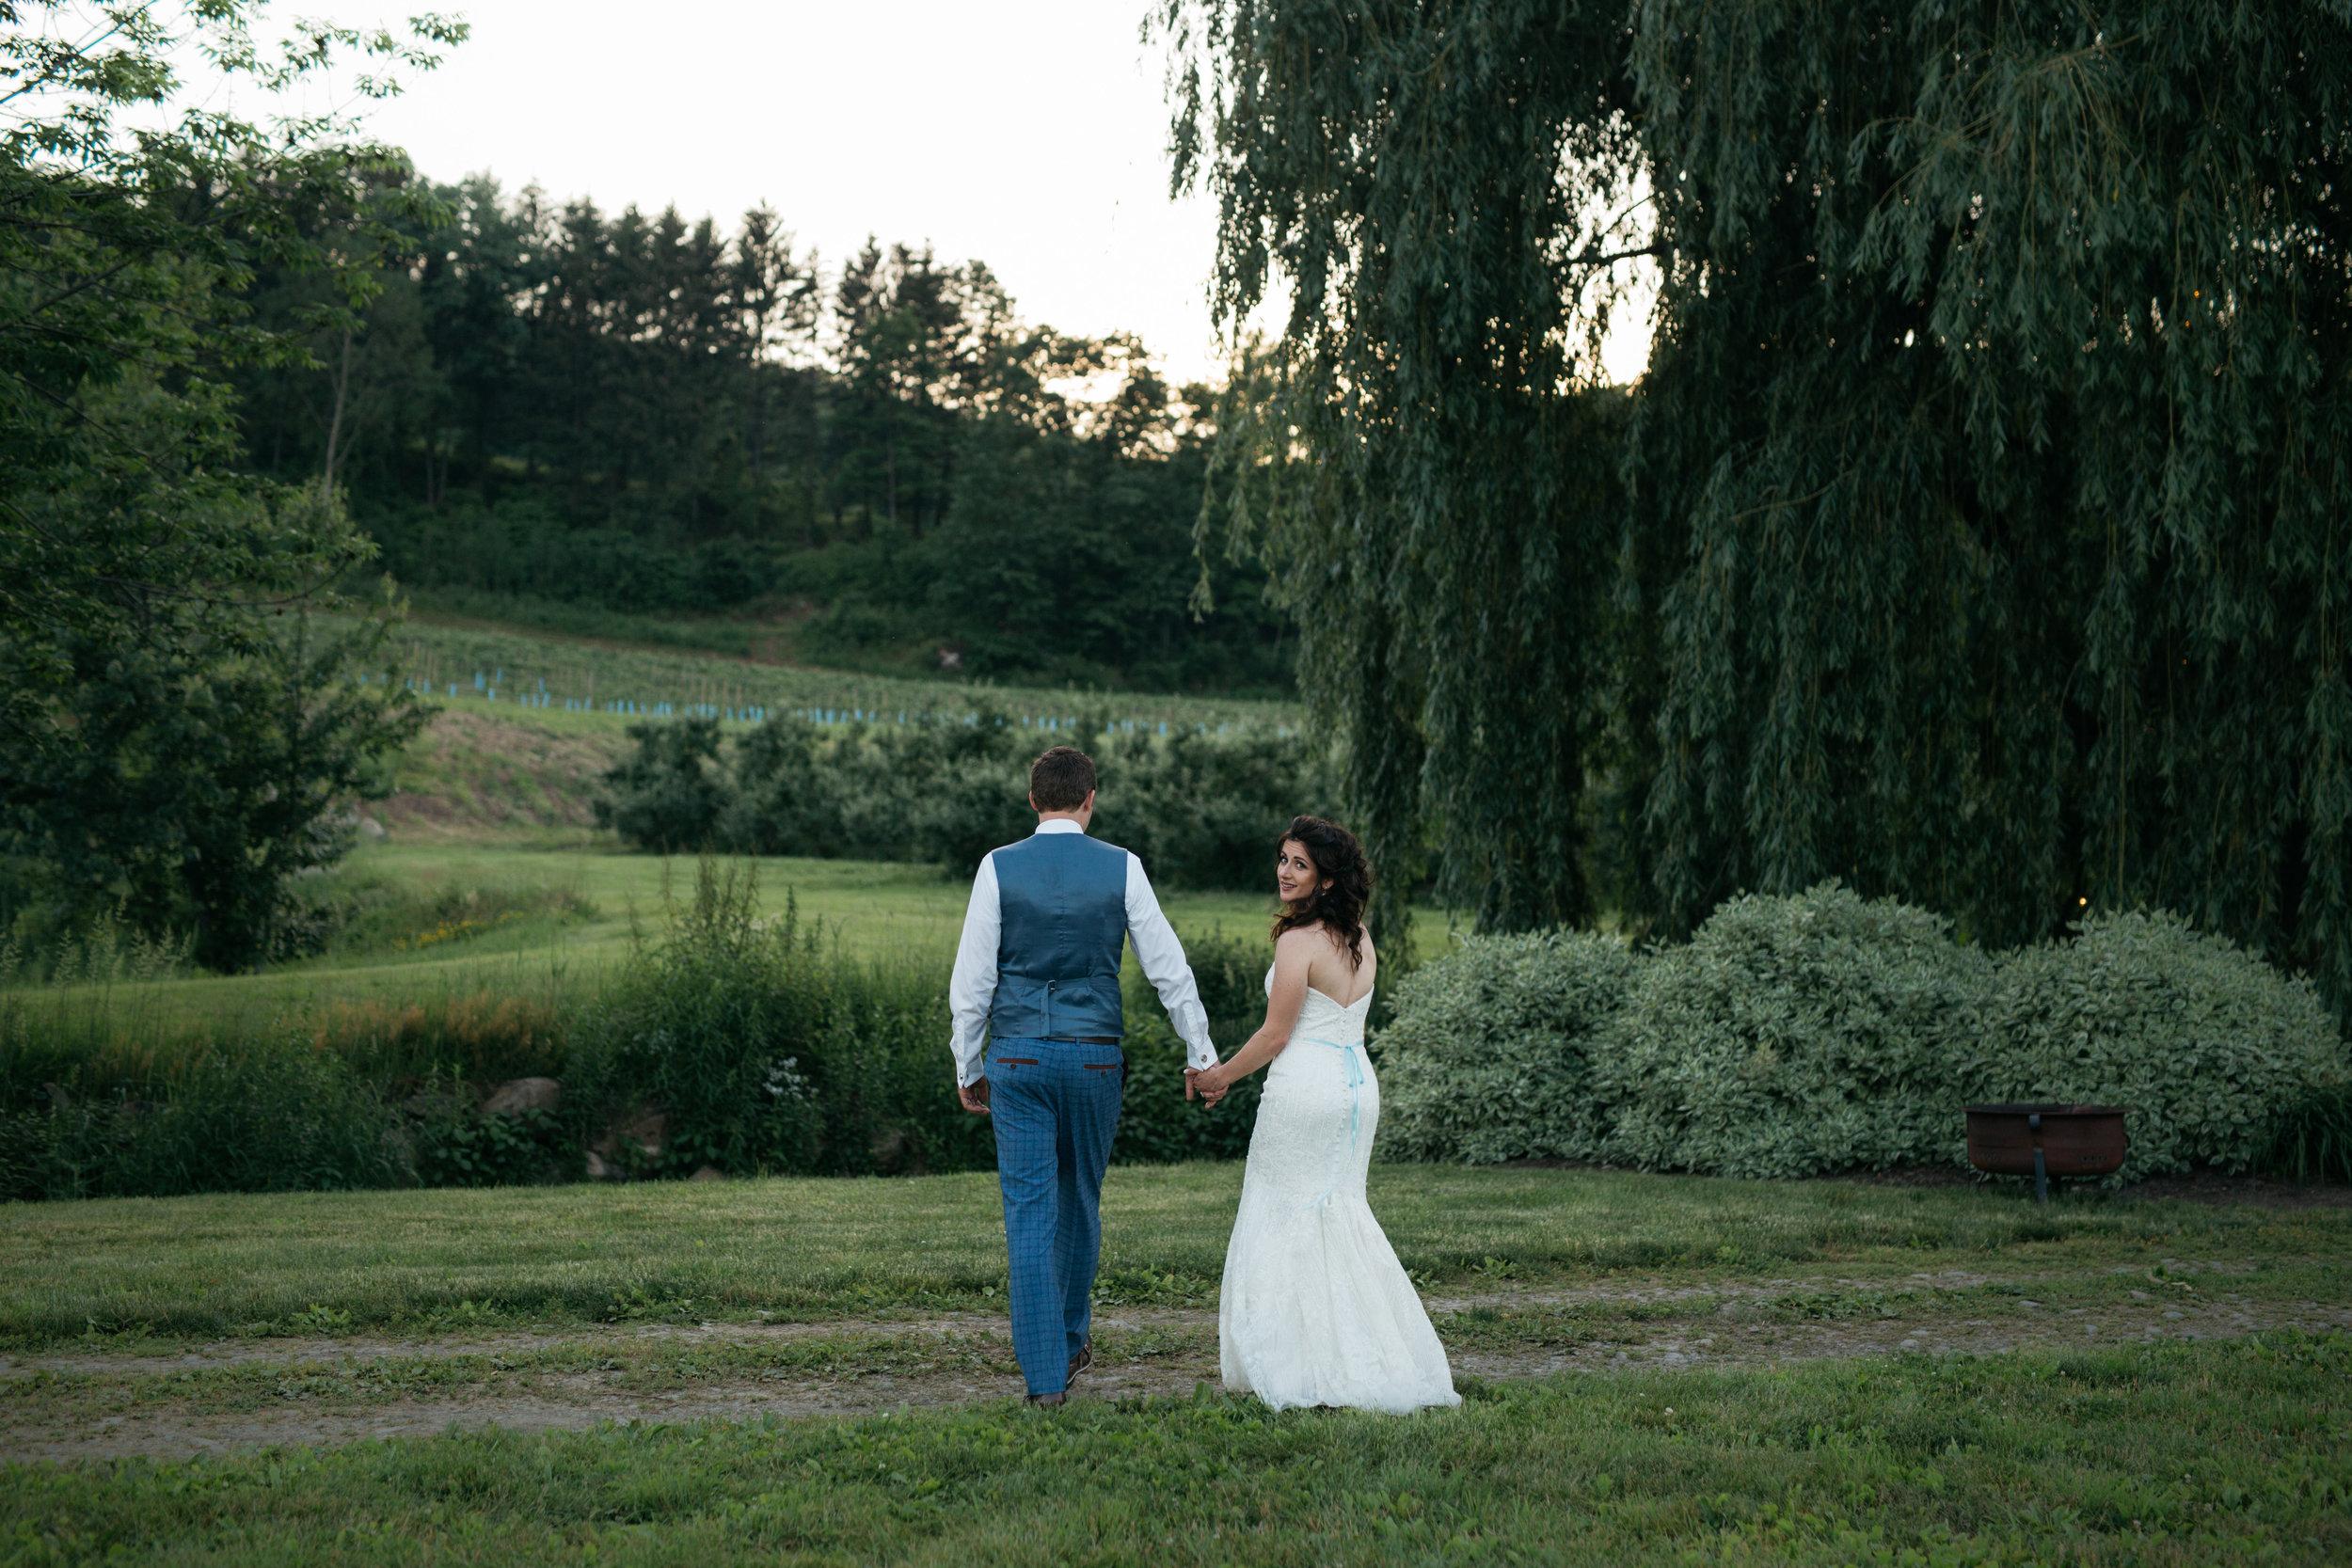 nostrano_vineyards_wedding_0083.JPG